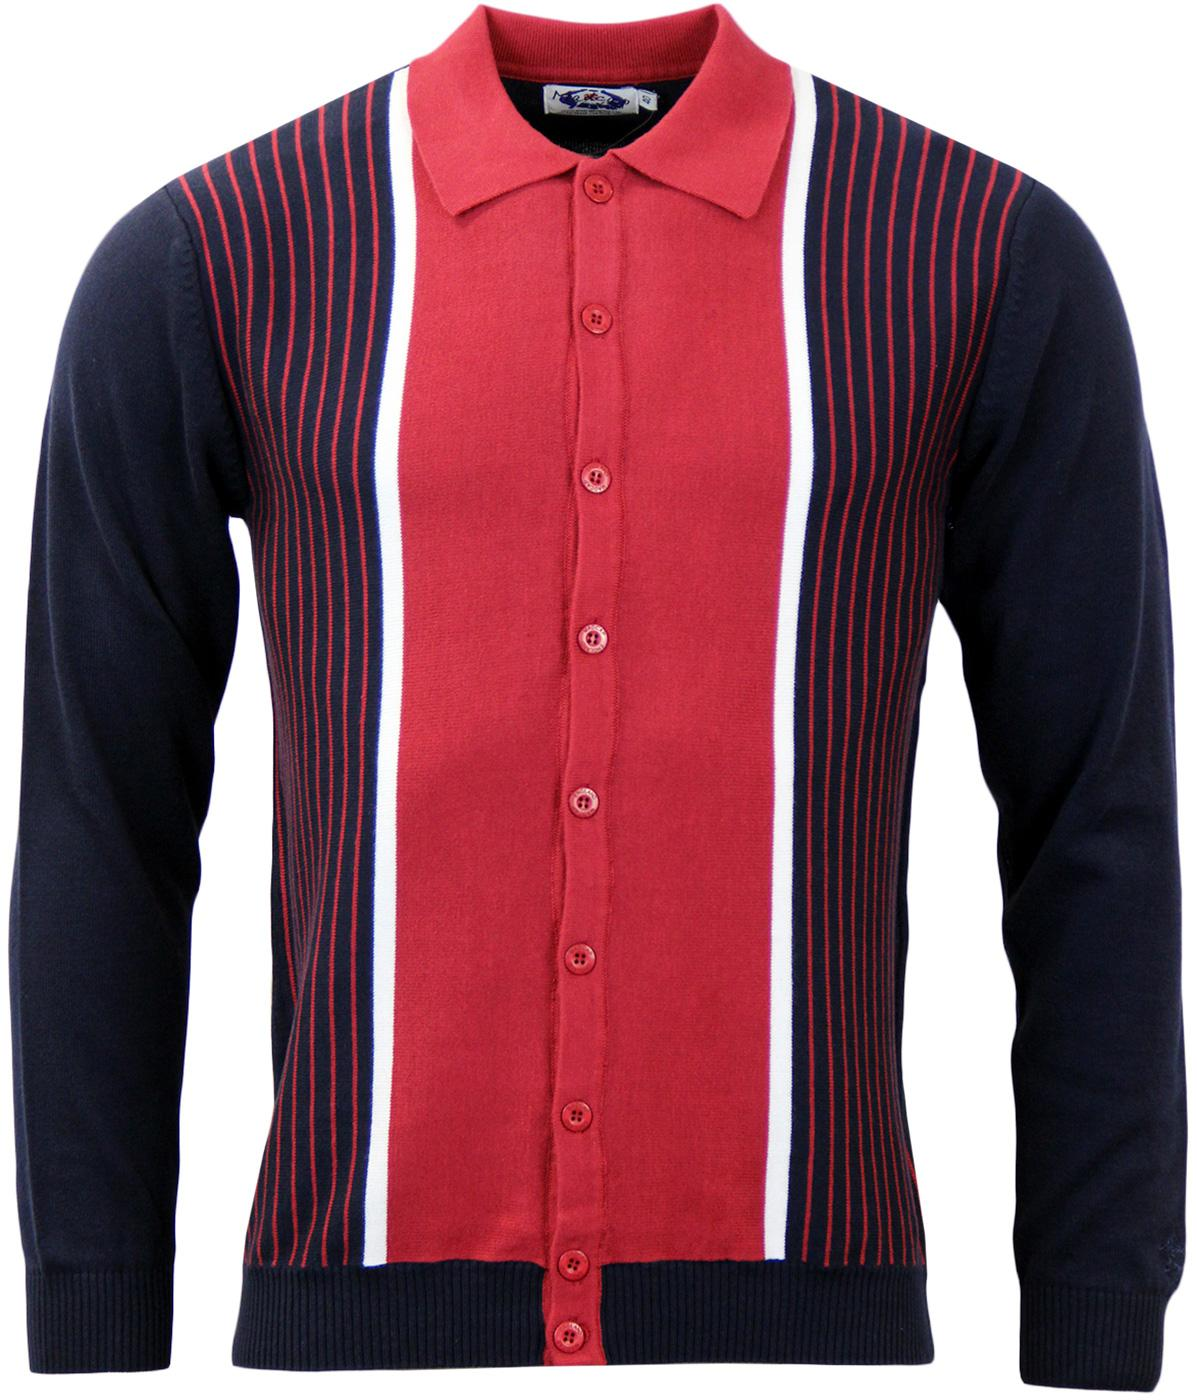 Pinstripe Marriott MADCAP ENGLAND Polo Cardigan N